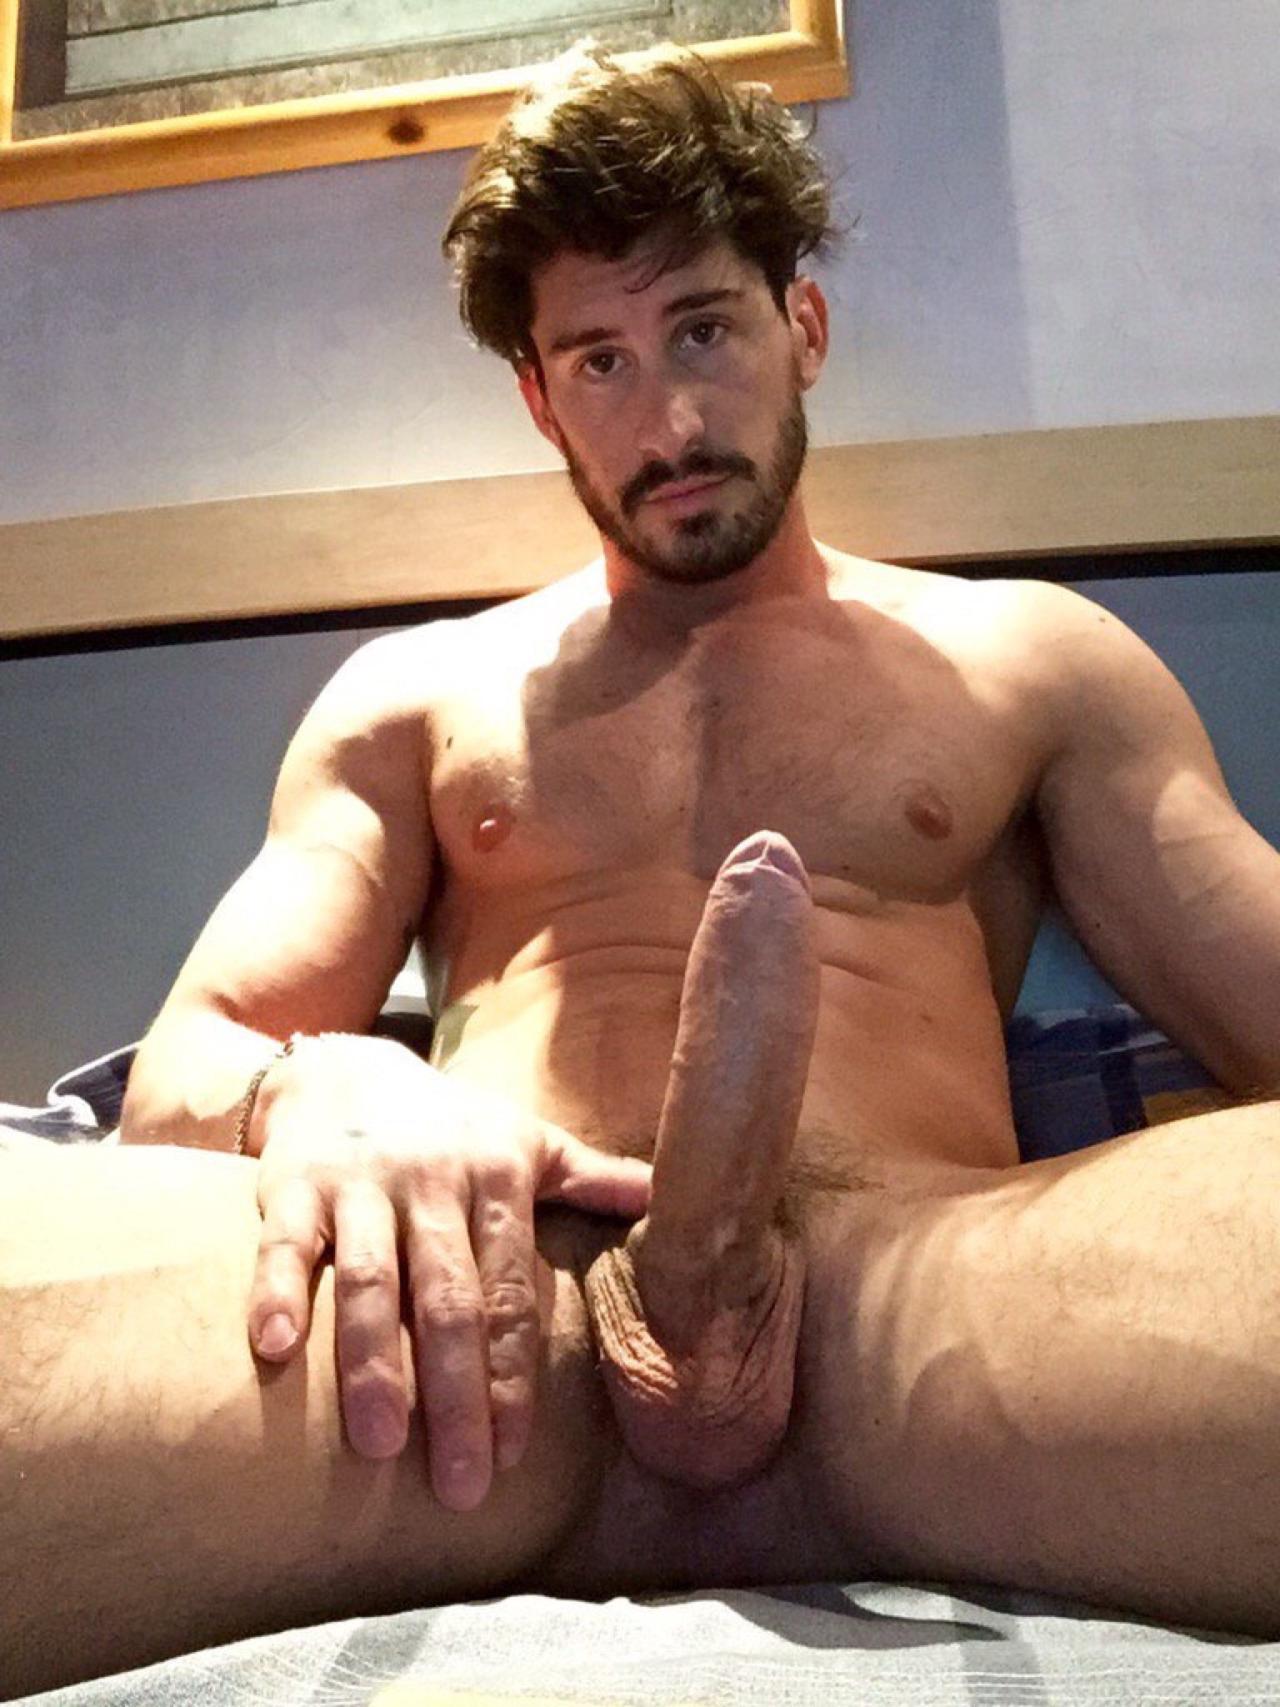 Male nude pics tumblr